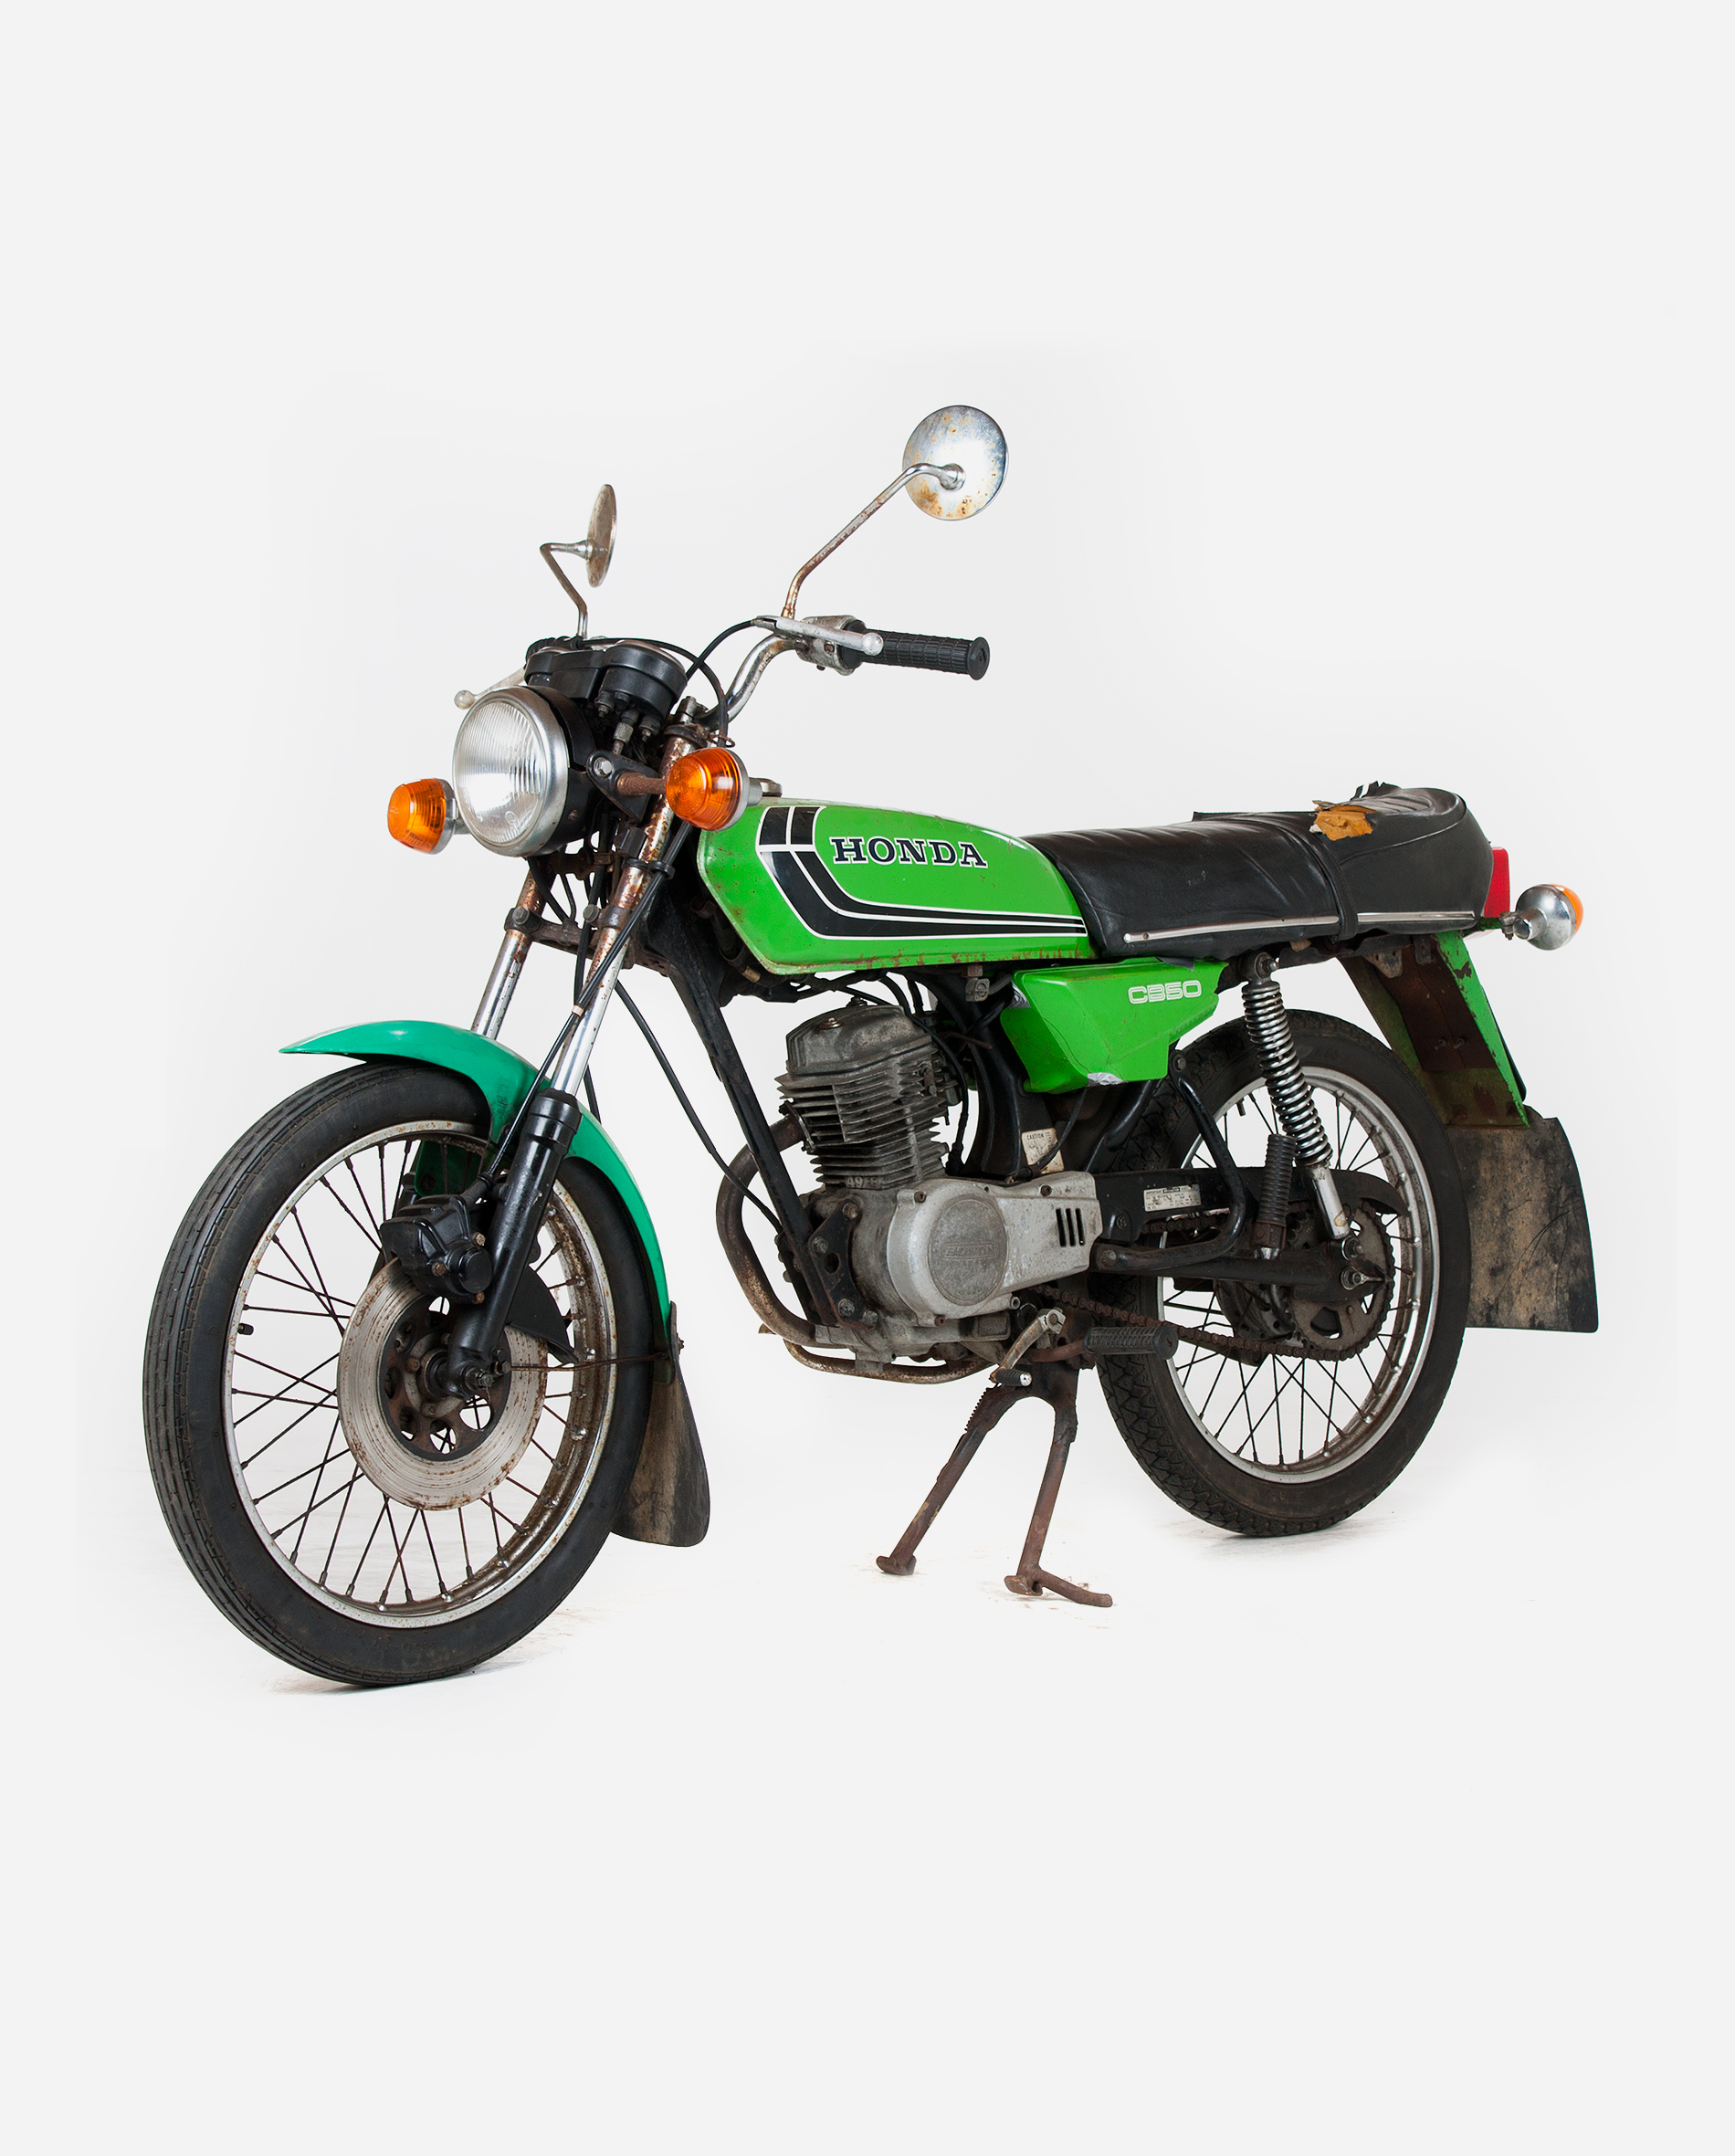 Honda-cb50-met-werk-lv · Fourstrokebarn